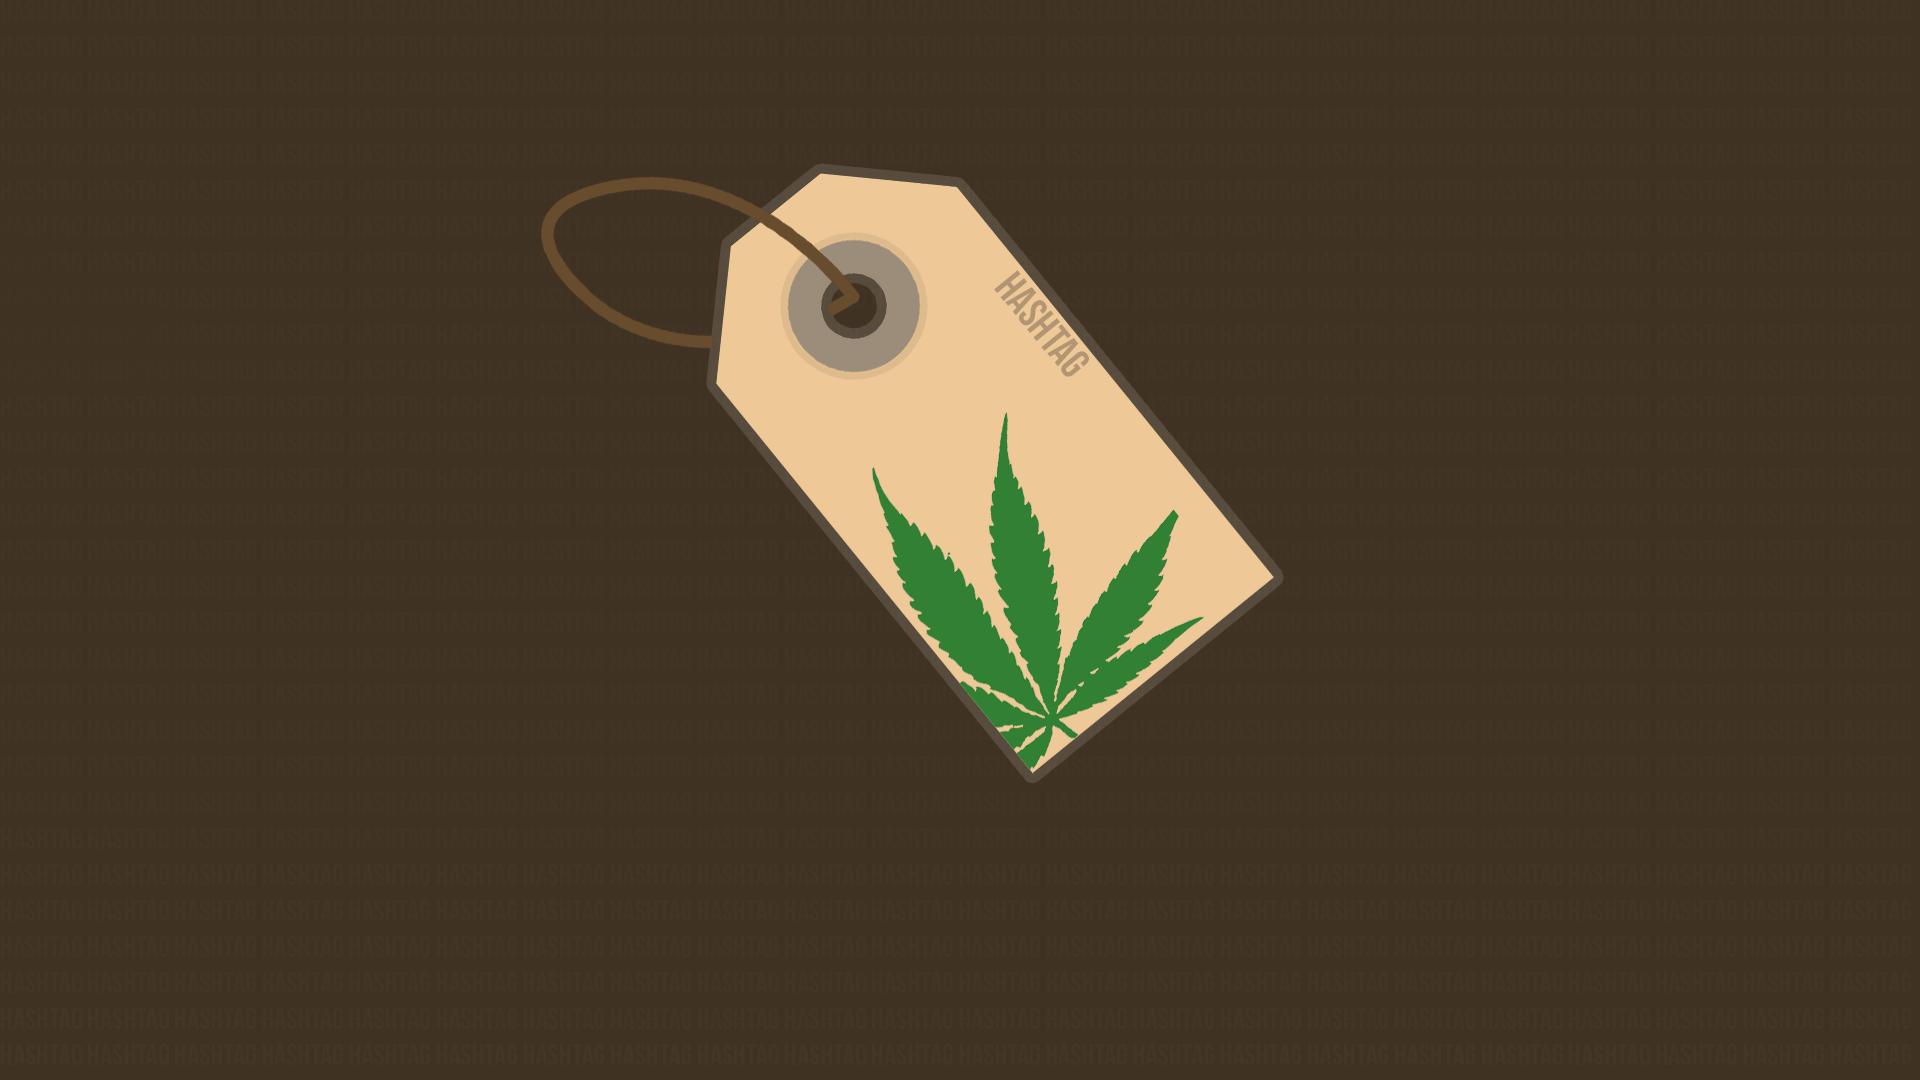 illustration logo cannabis hashtags leaf shape wing computer wallpaper font 170089